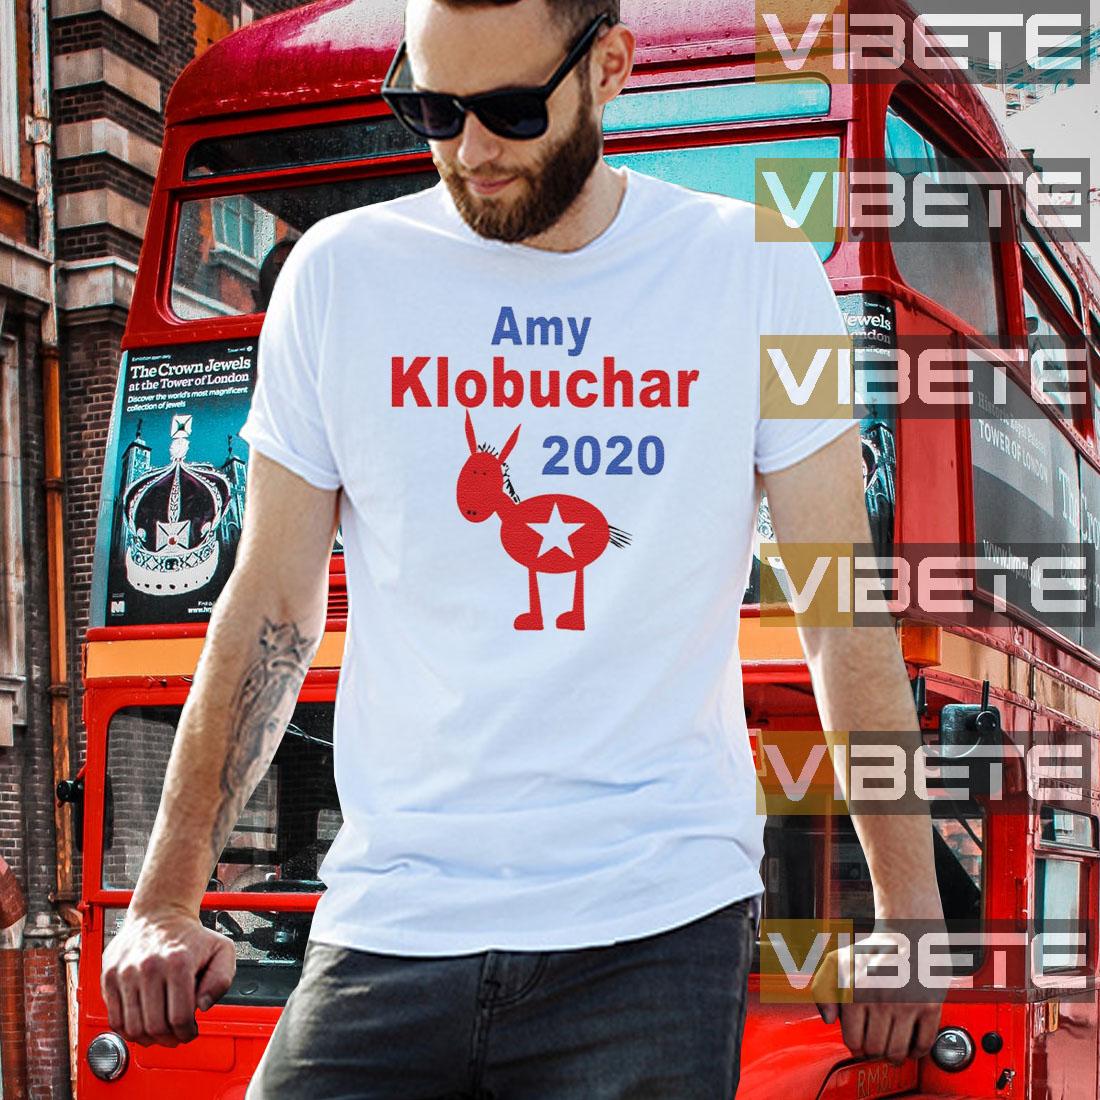 Amy Klobuchar President 2020 t-shirt